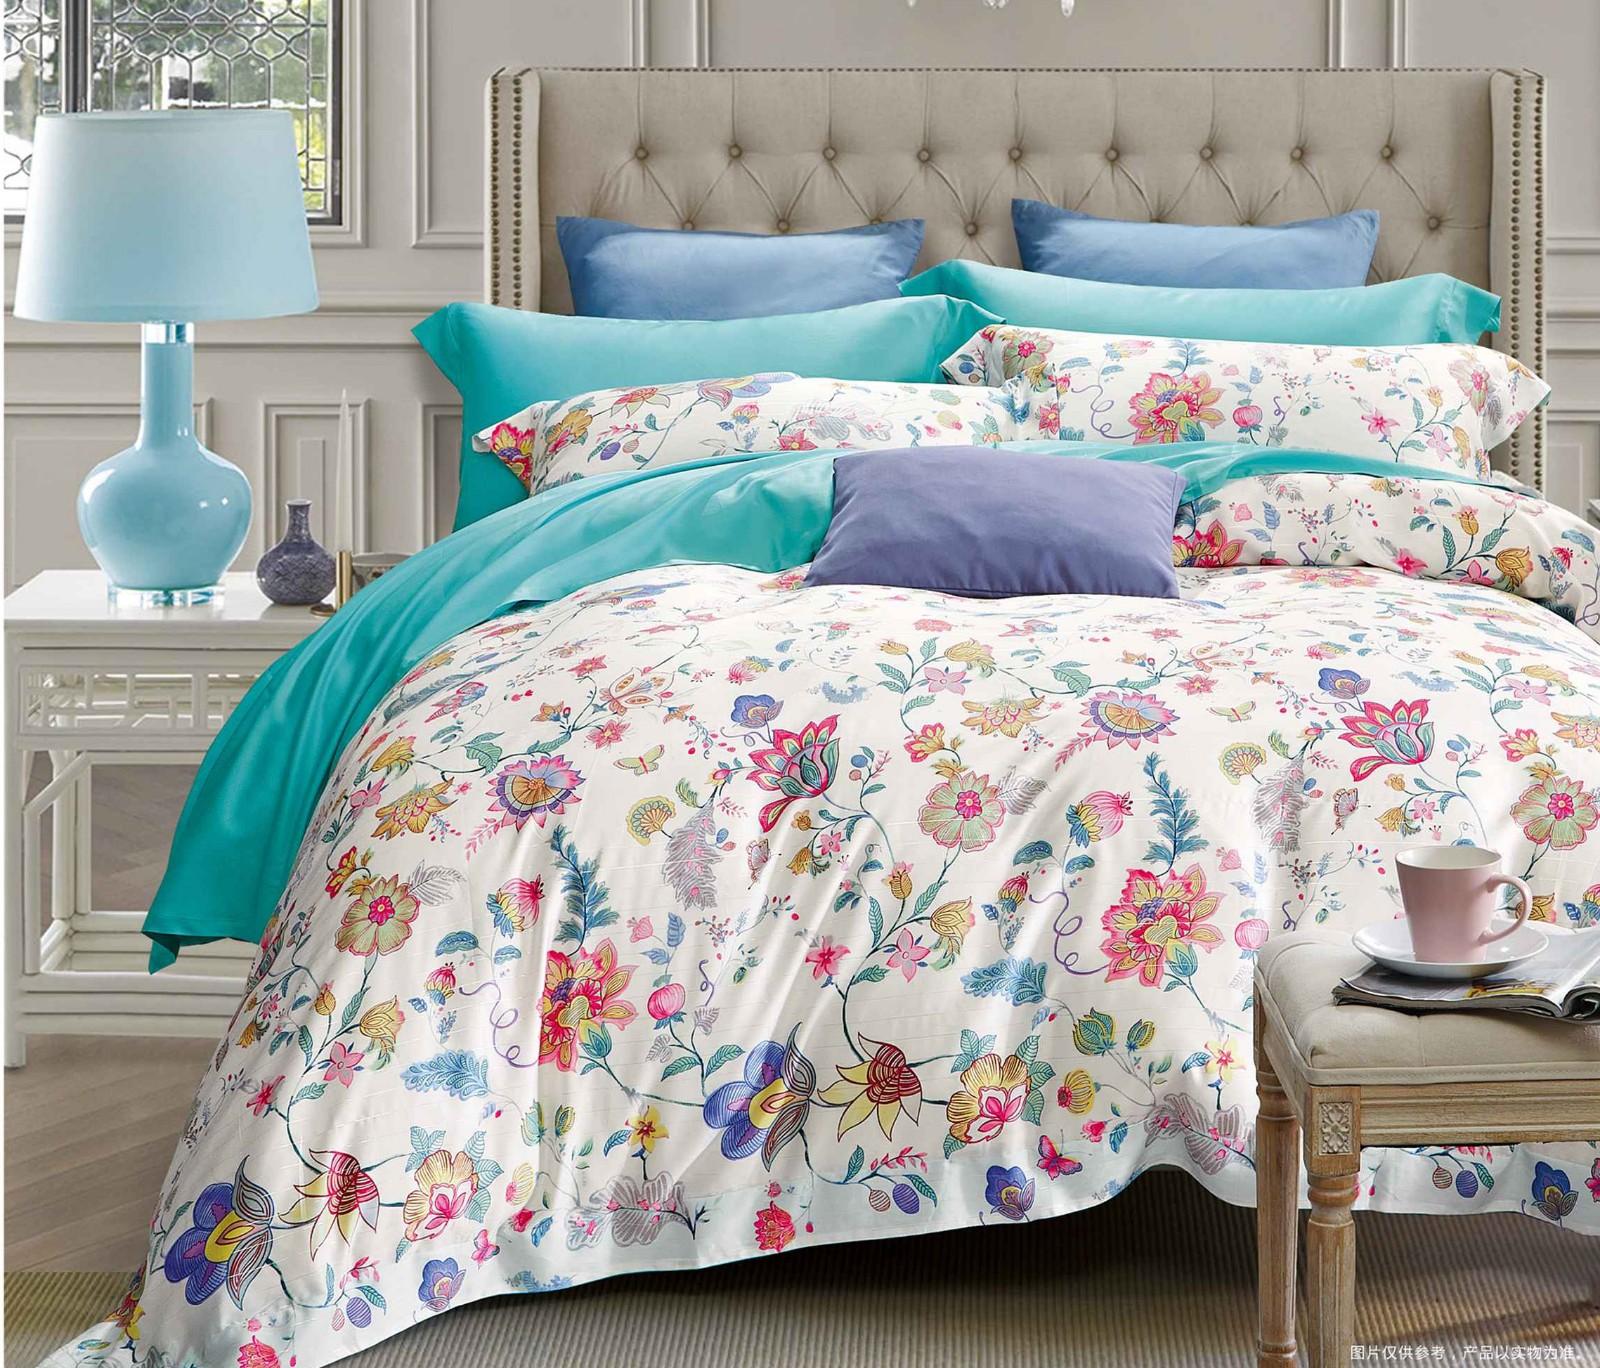 Daphne Brand garden duvet comforters modal sheets